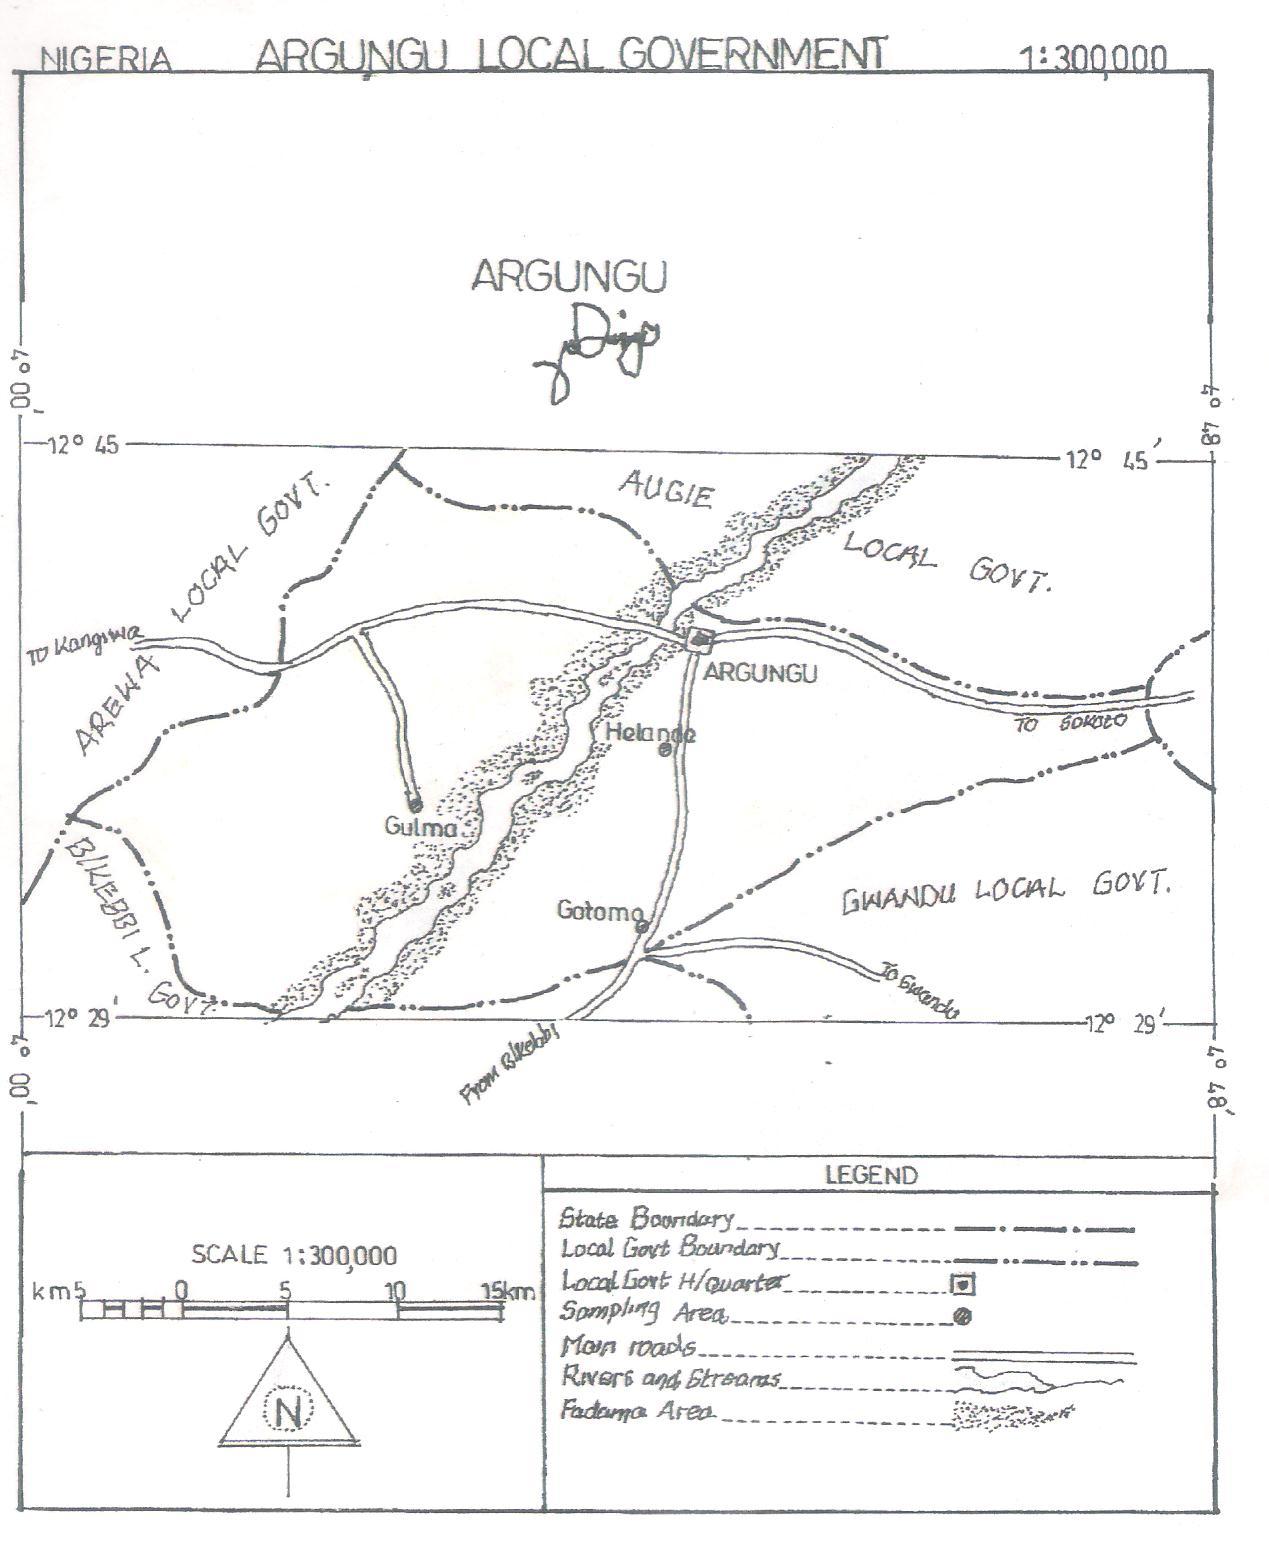 C:\Users\User\Documents\Scanned Documents\Argungu map 1.jpg